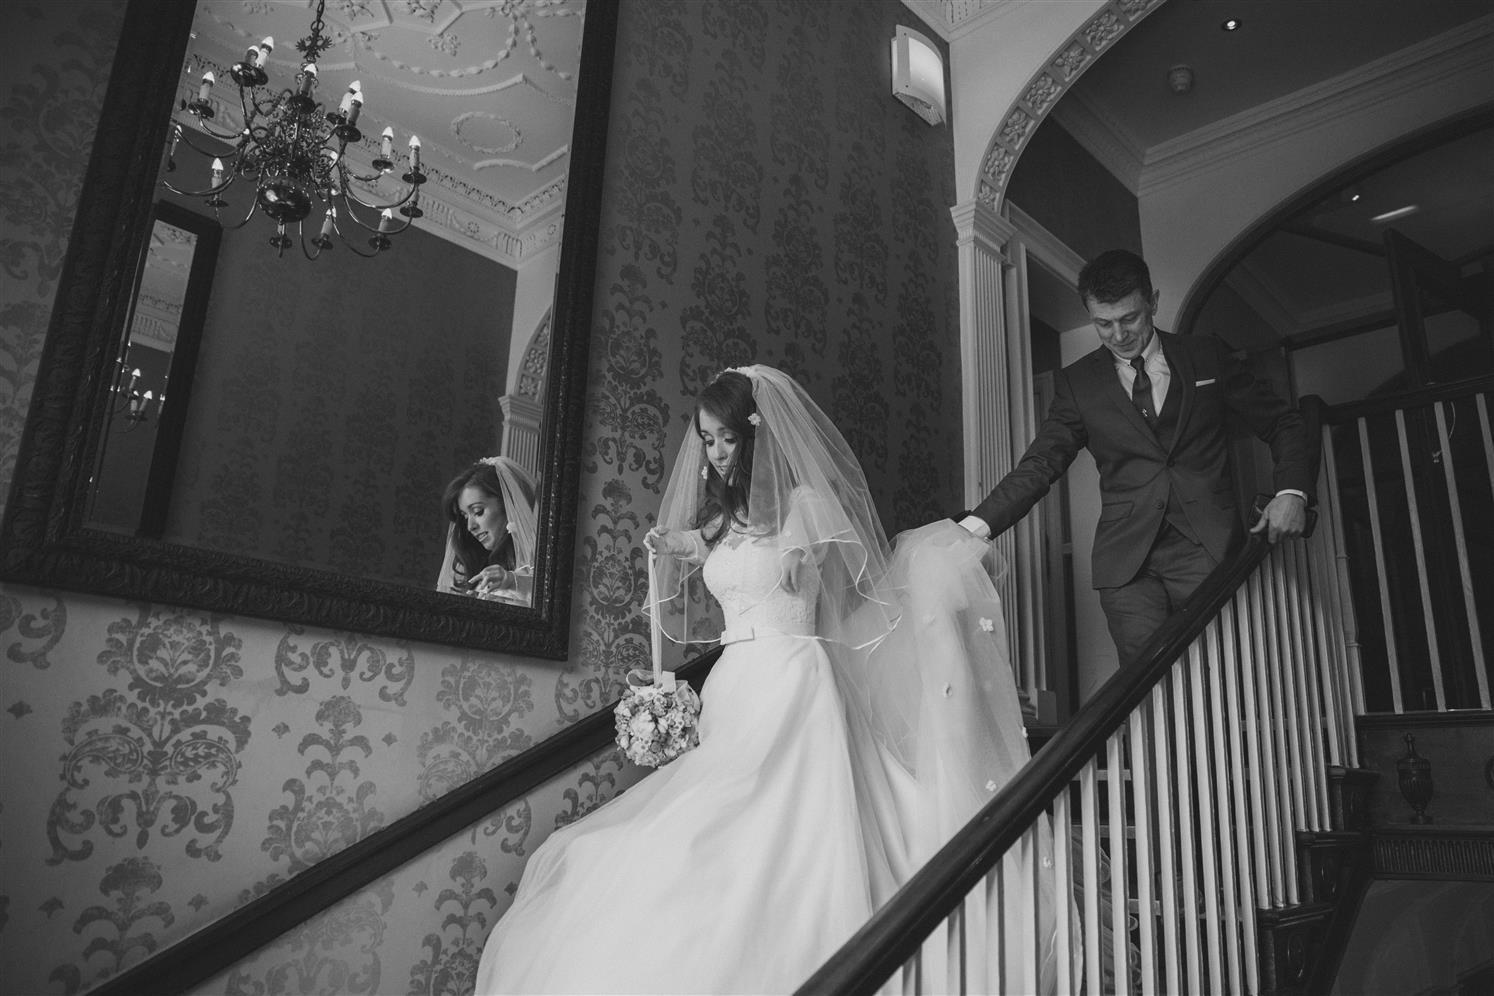 Bride - A Spring 1960s Inspired Wedding